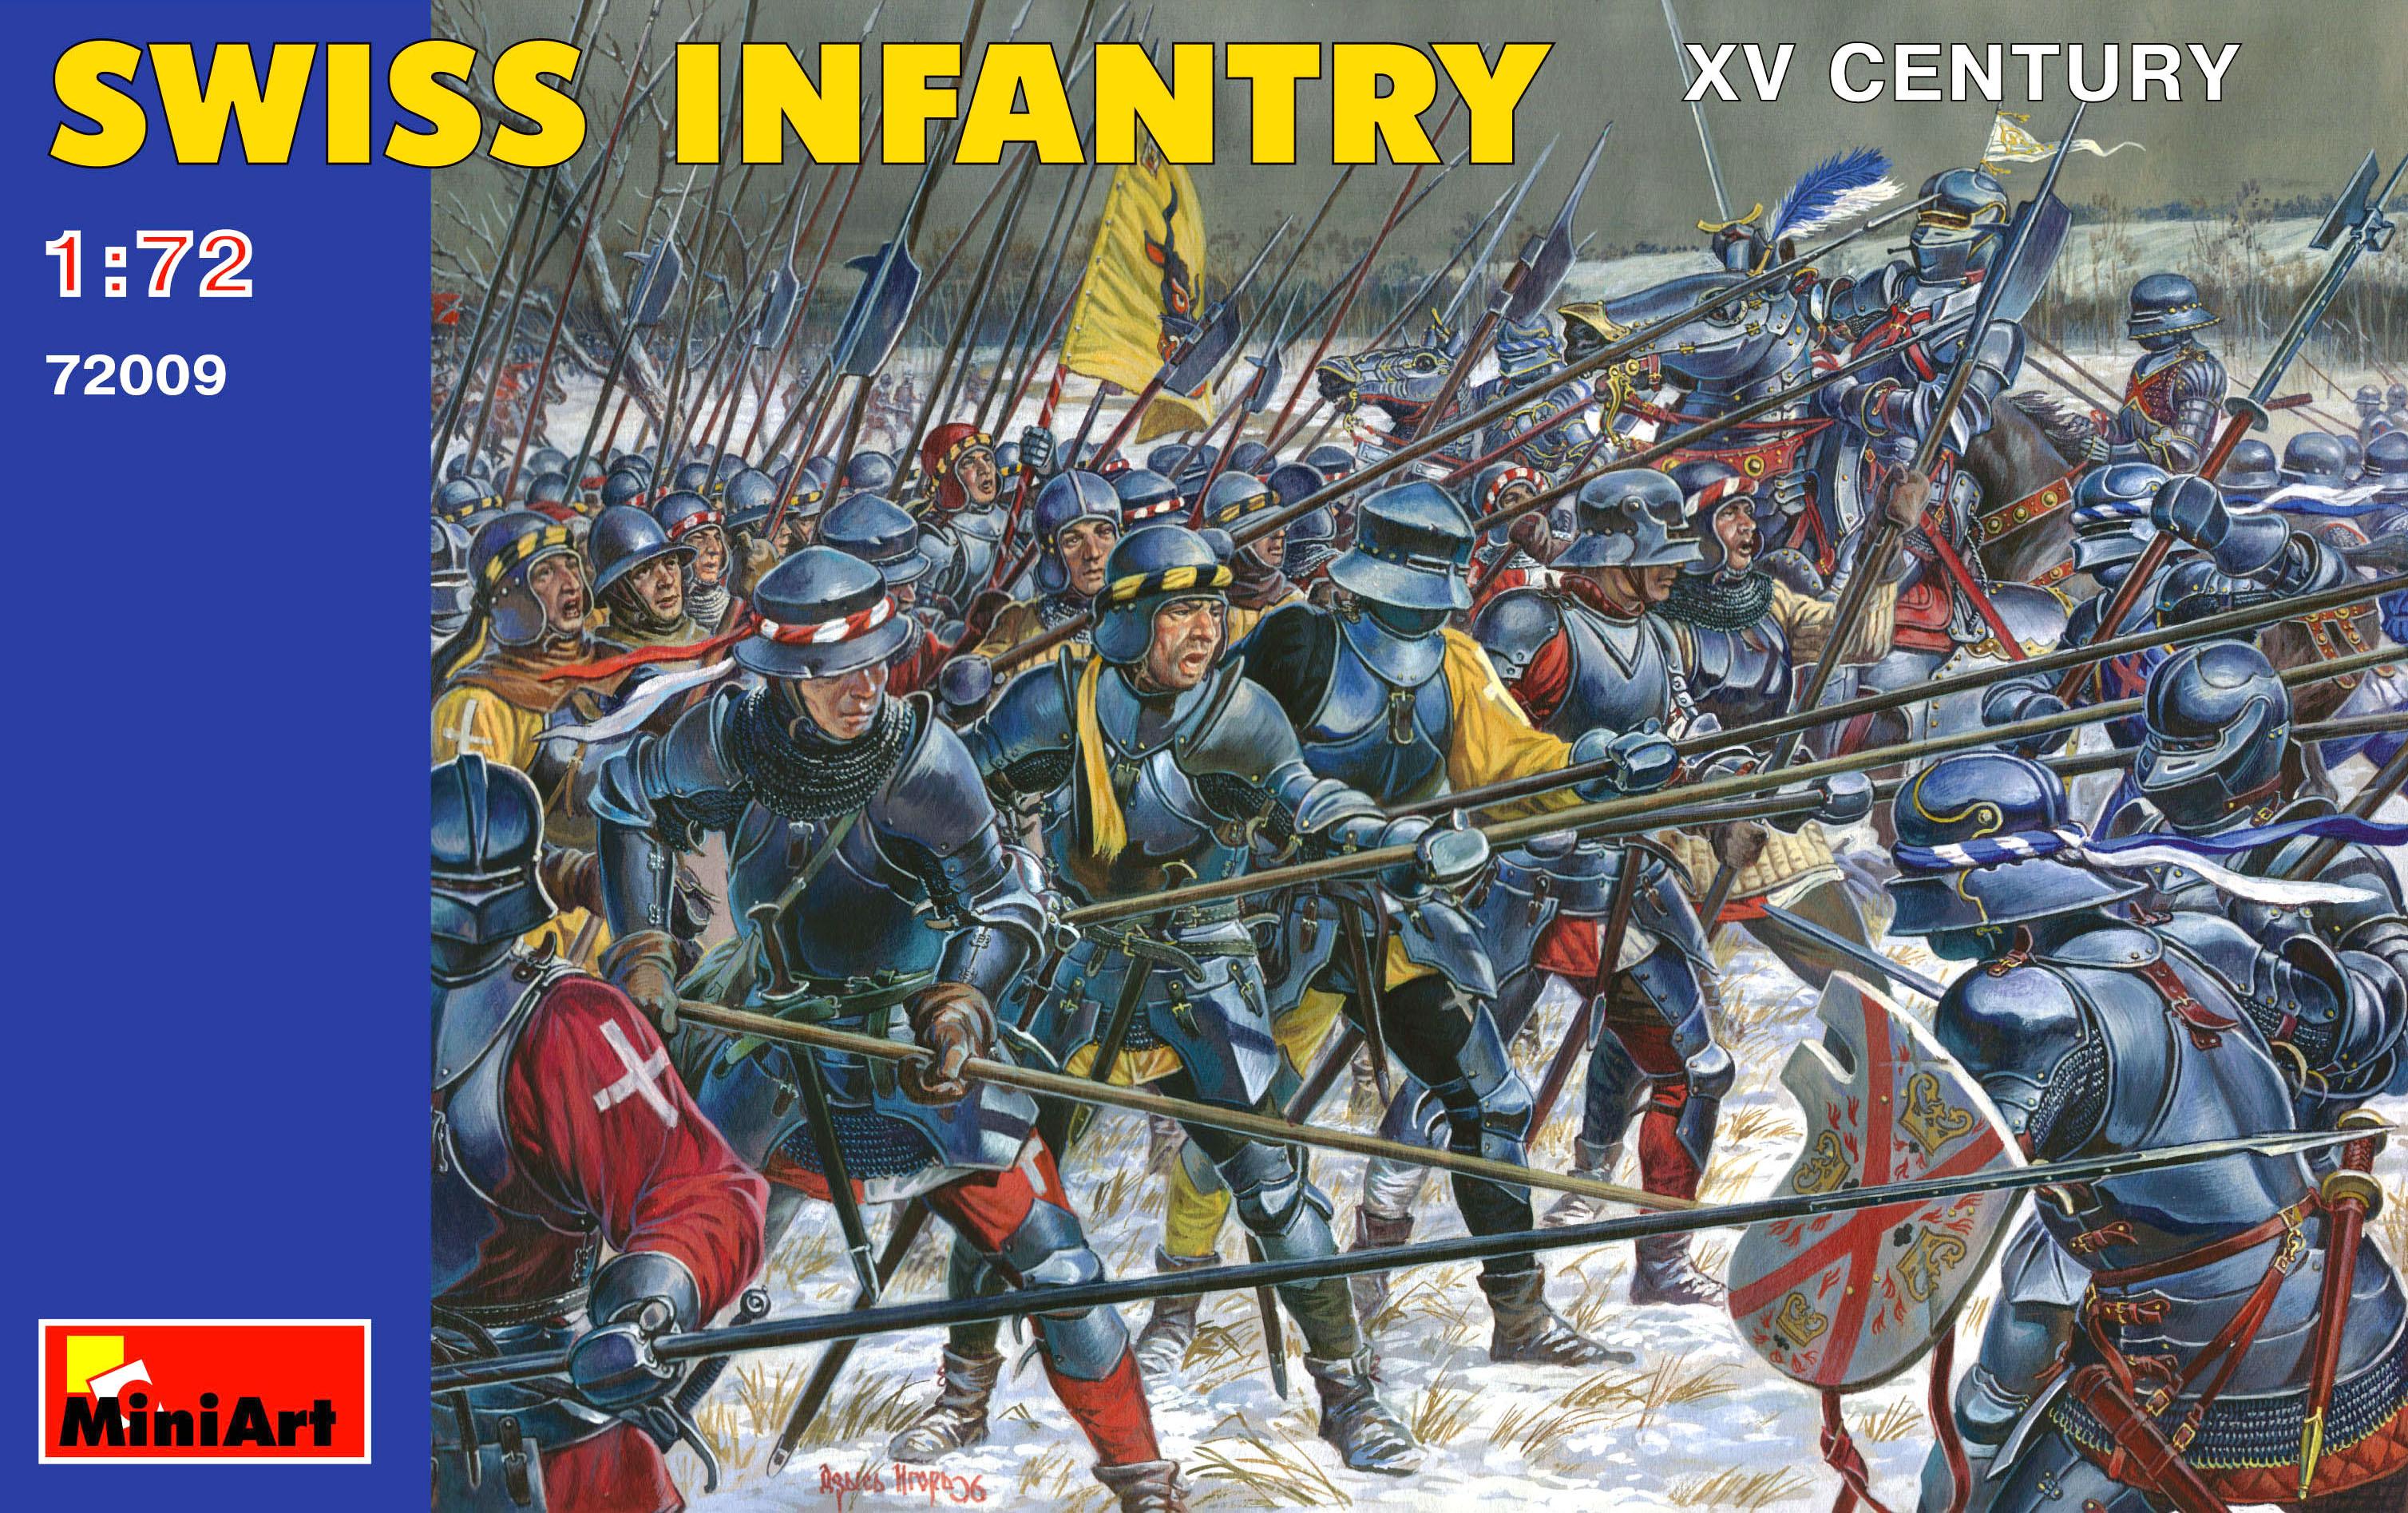 72009 SWISS INFANTRY XV CENTURY